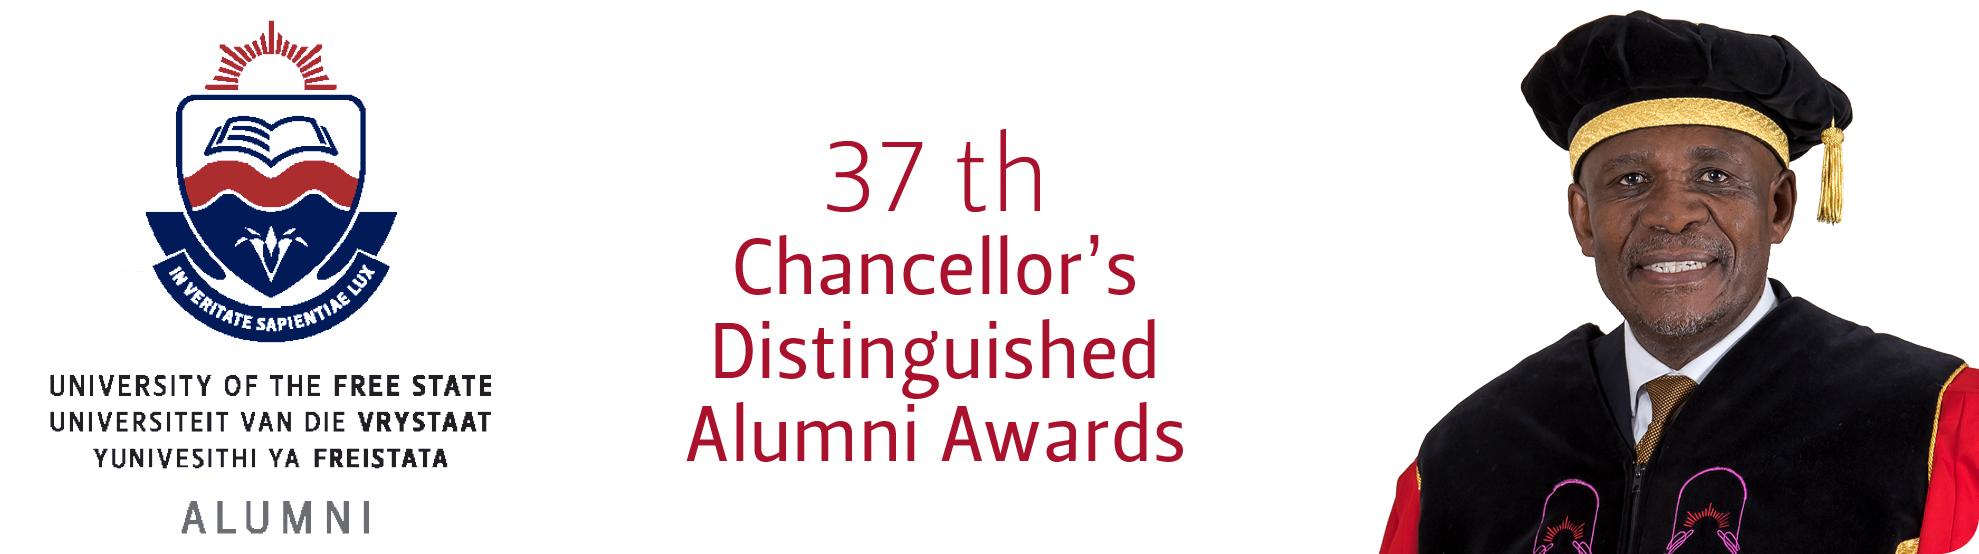 Alumni Call for Registration